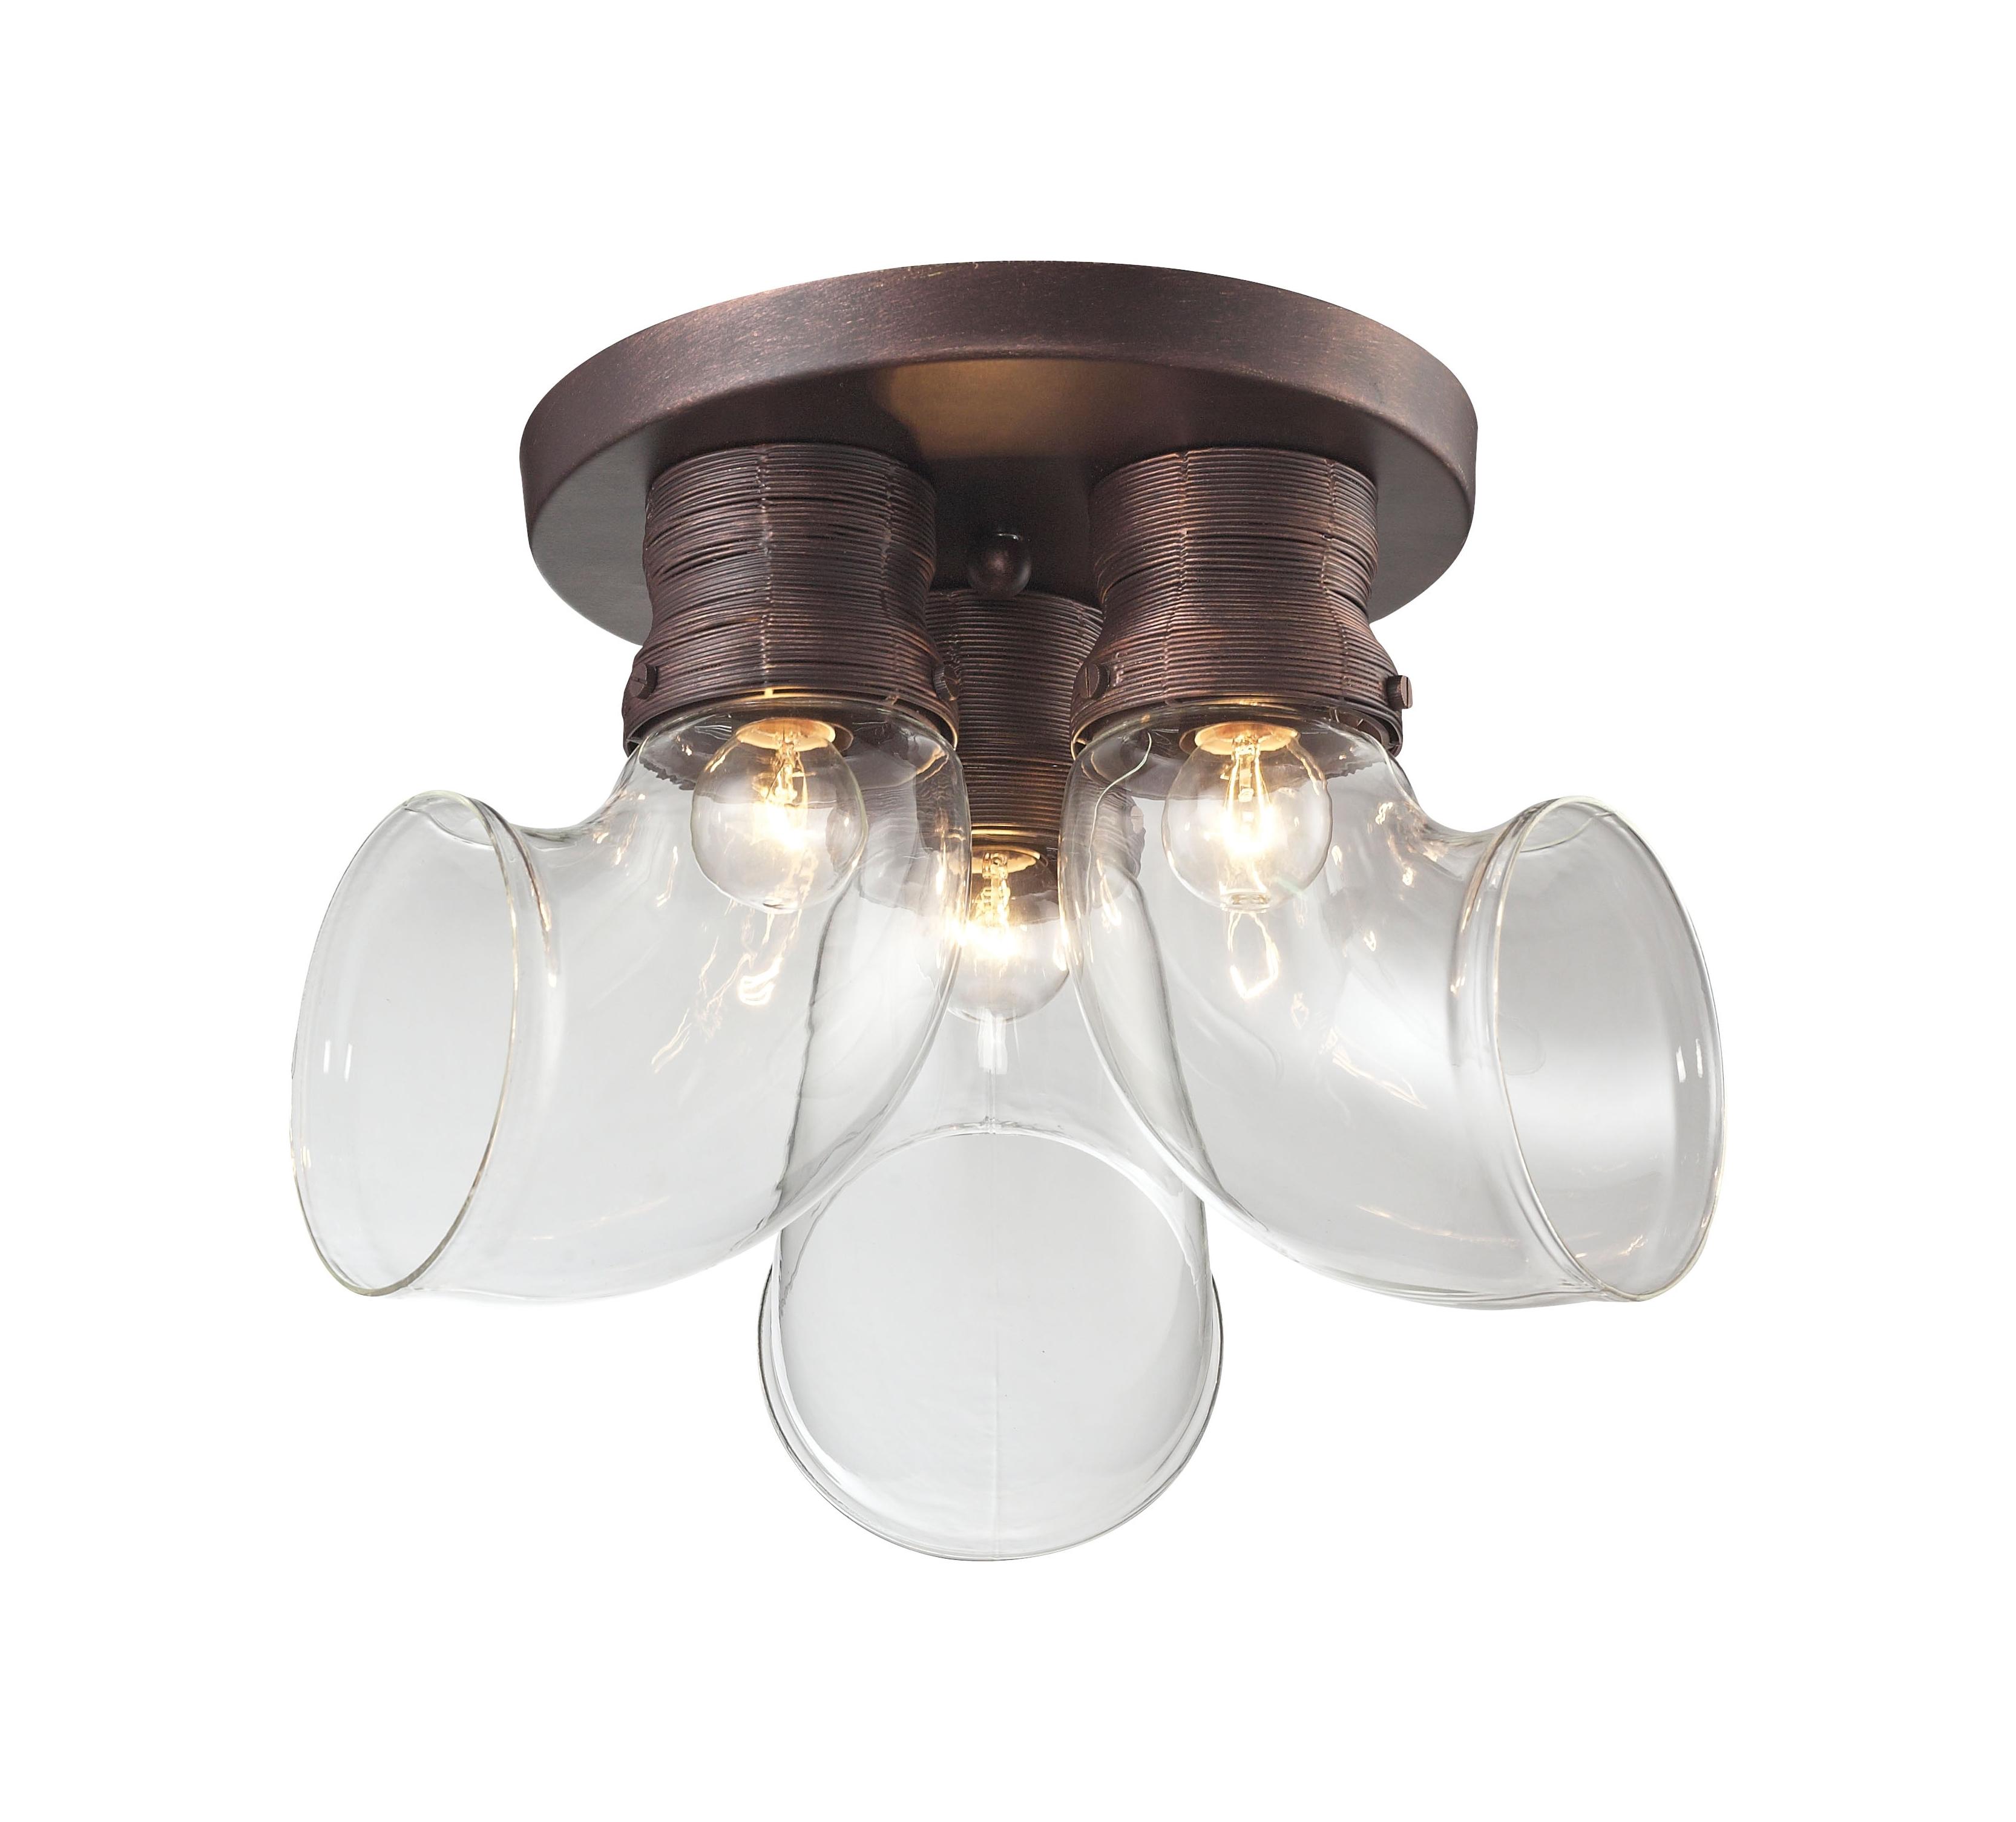 Потолочный светильникПотолочные светильники<br>Материал: металл<br>Лампа: 3*40W<br>Цоколь: E14<br>Цвет: венге<br><br>Material: Металл<br>Высота см: 25